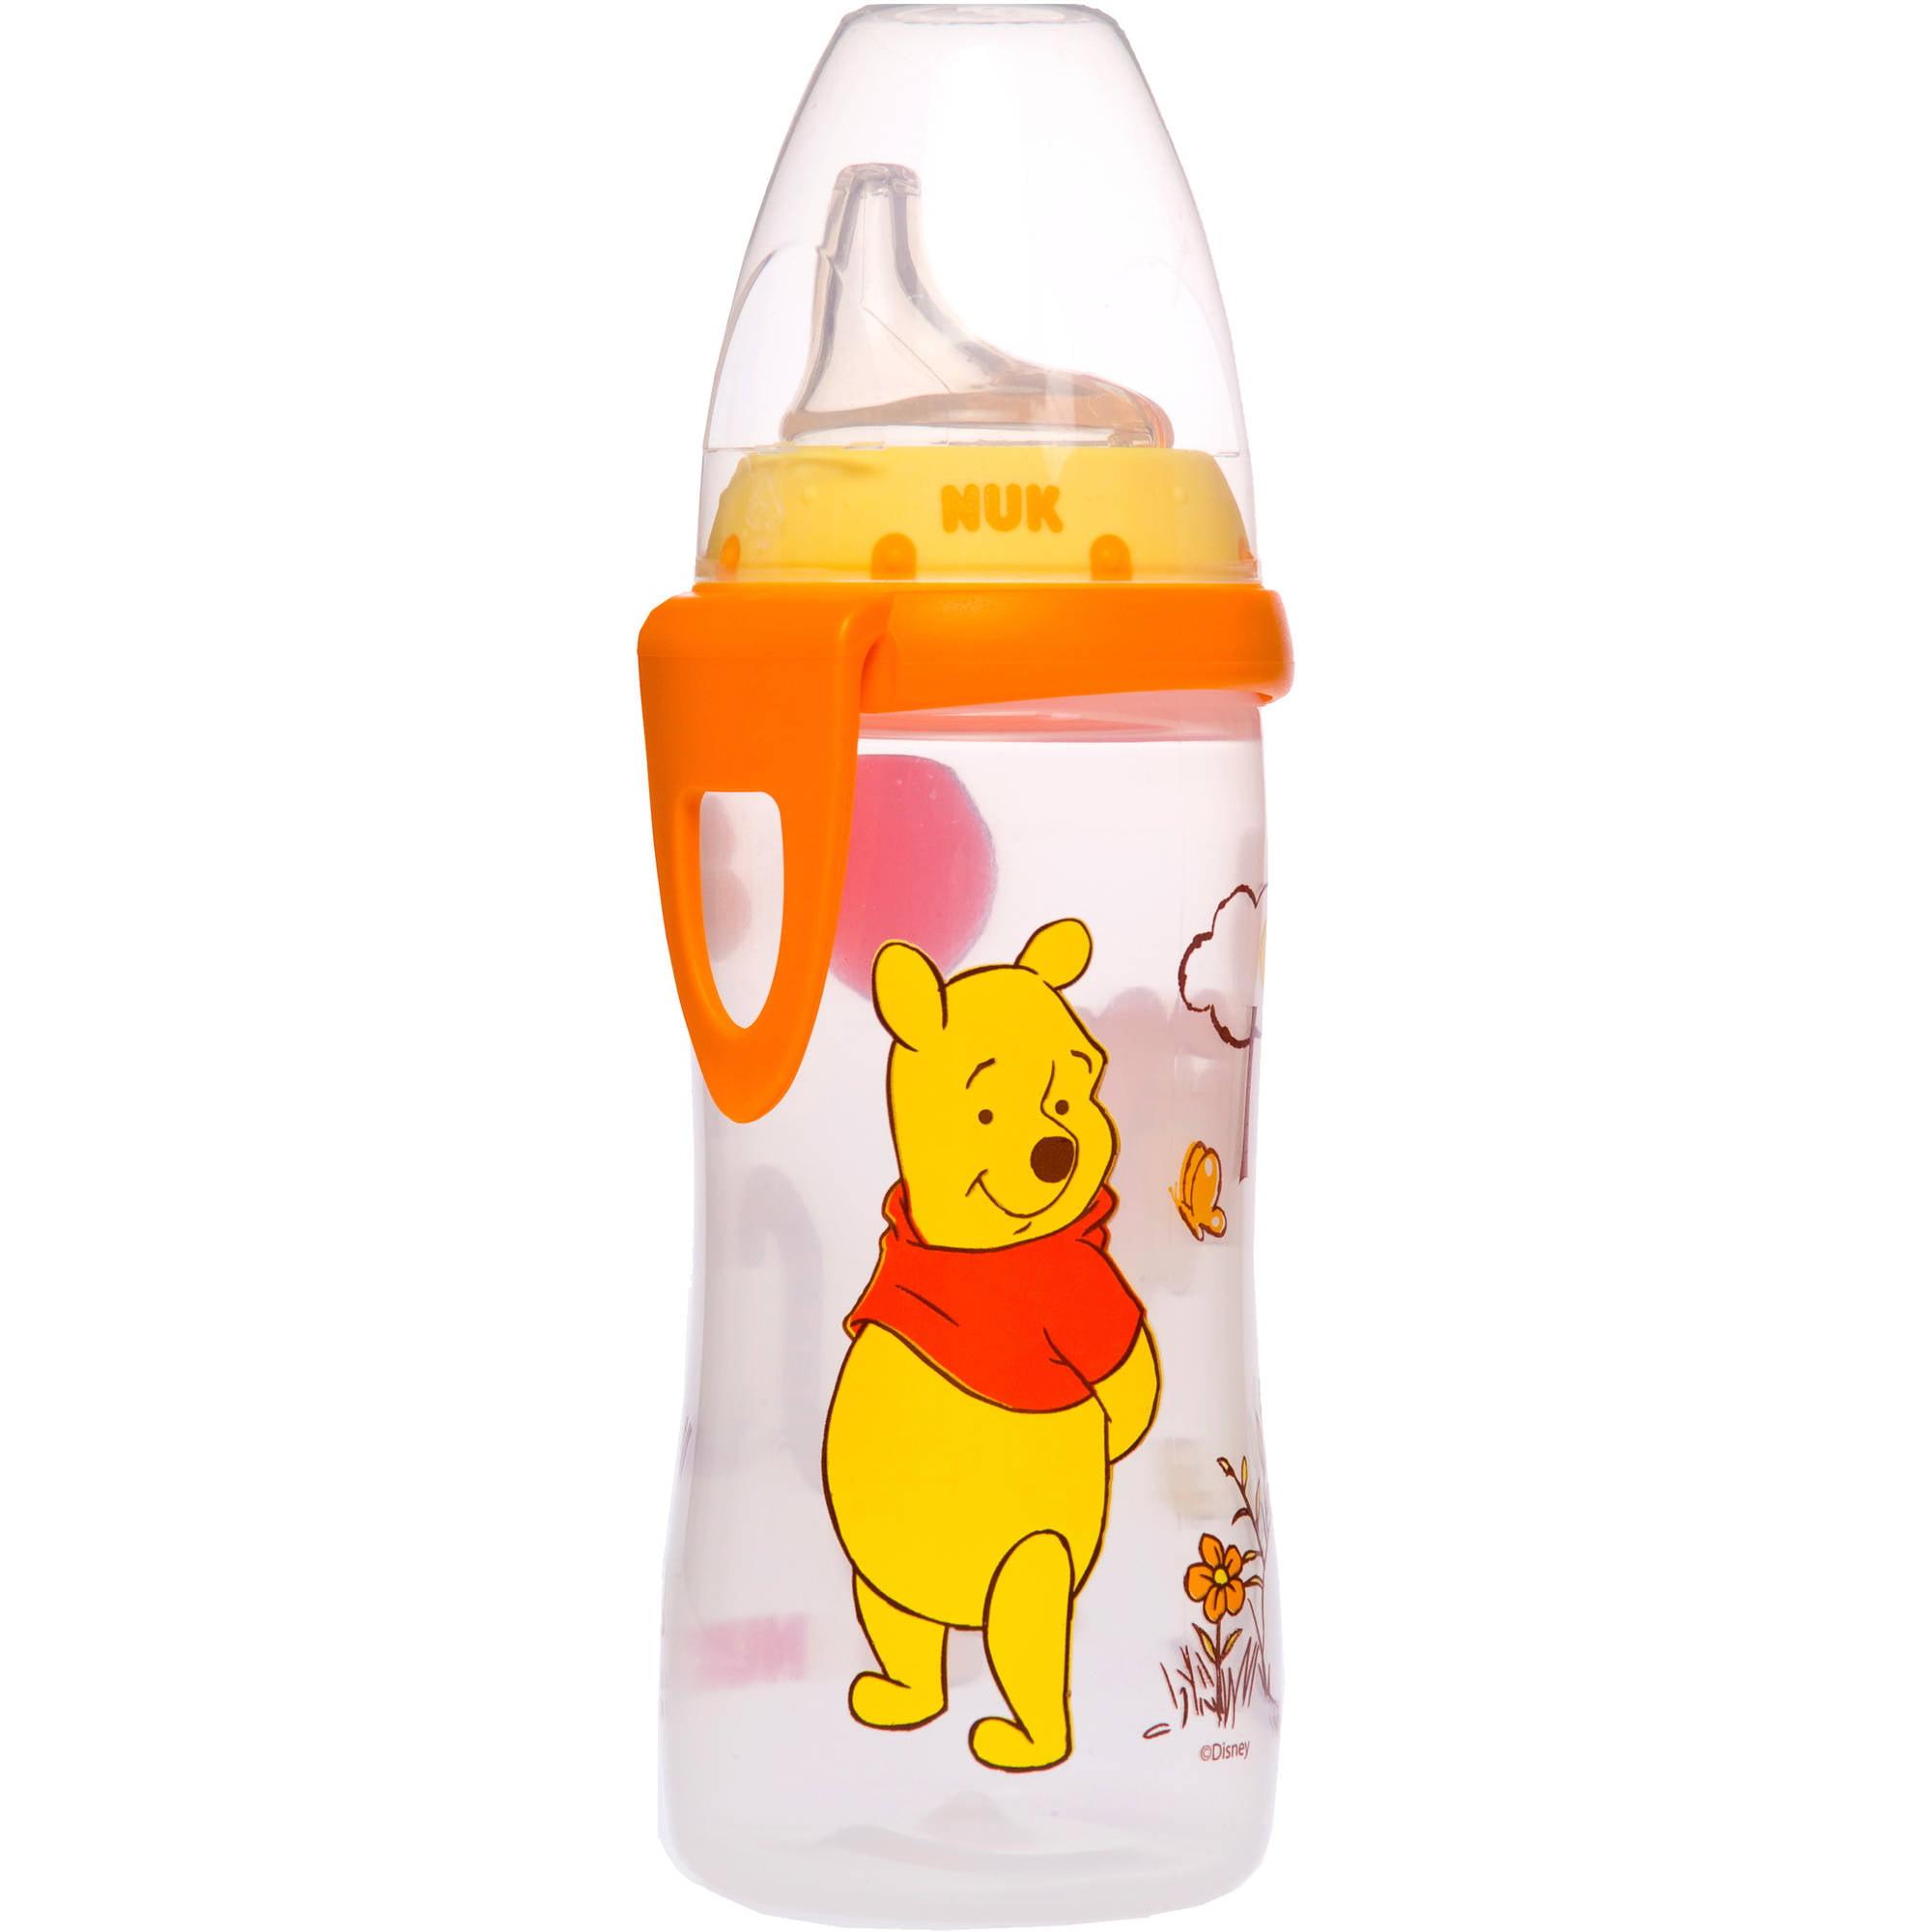 NUK - Disney Winnie the Pooh 10oz Silicone Spout Active Cup, BPA-Free